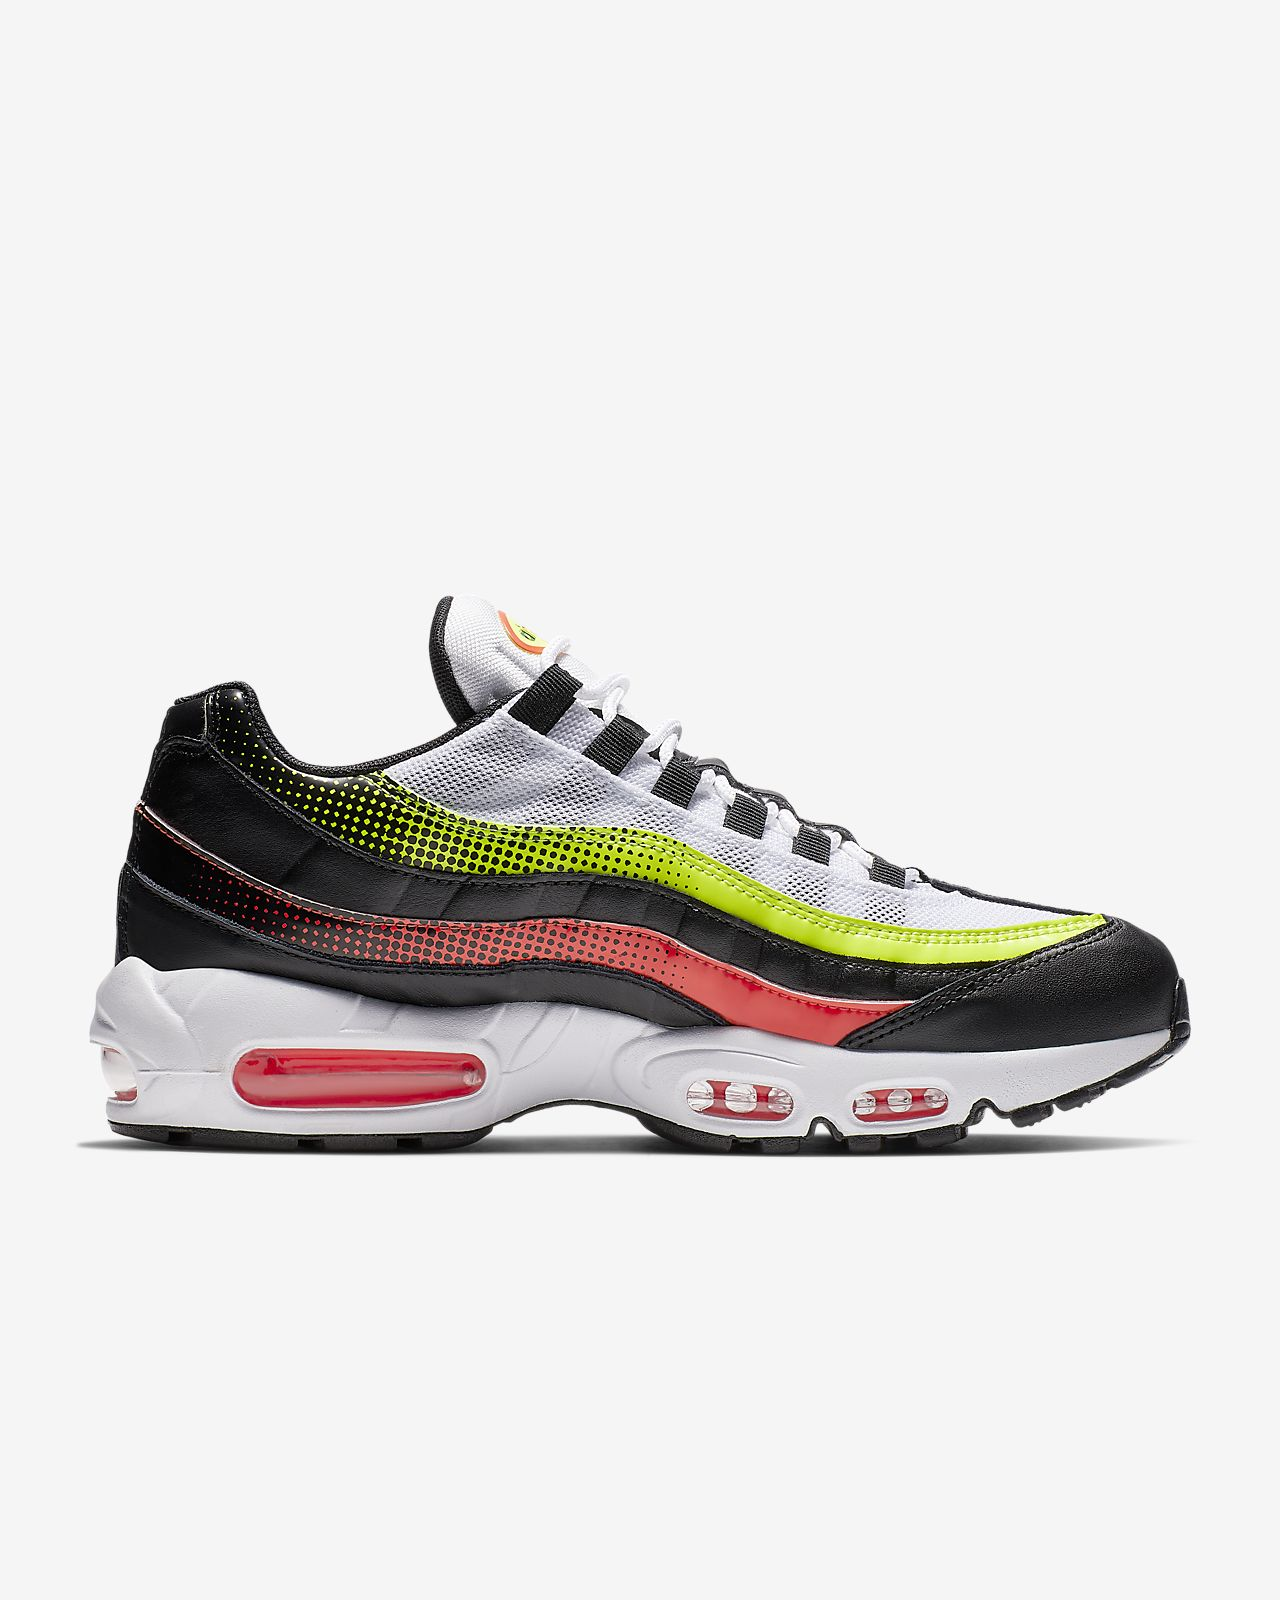 afc425e0671b Low Resolution Nike Air Max 95 SE Men's Shoe Nike Air Max 95 SE Men's Shoe